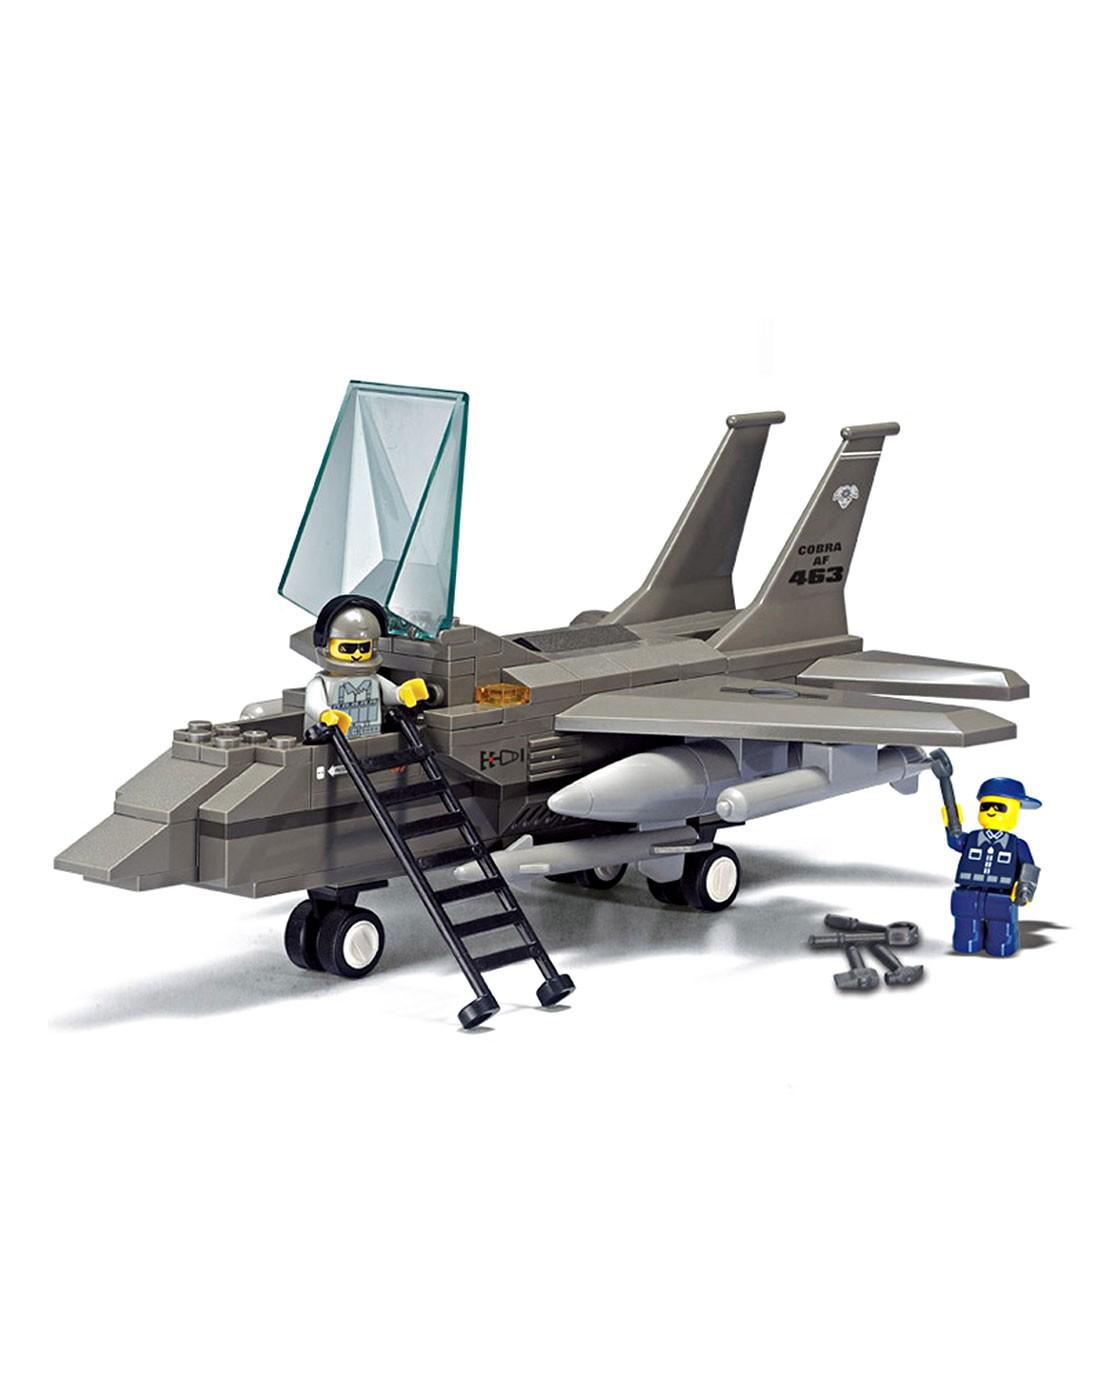 stones玩具专场空军战队f-15战斗机m0027